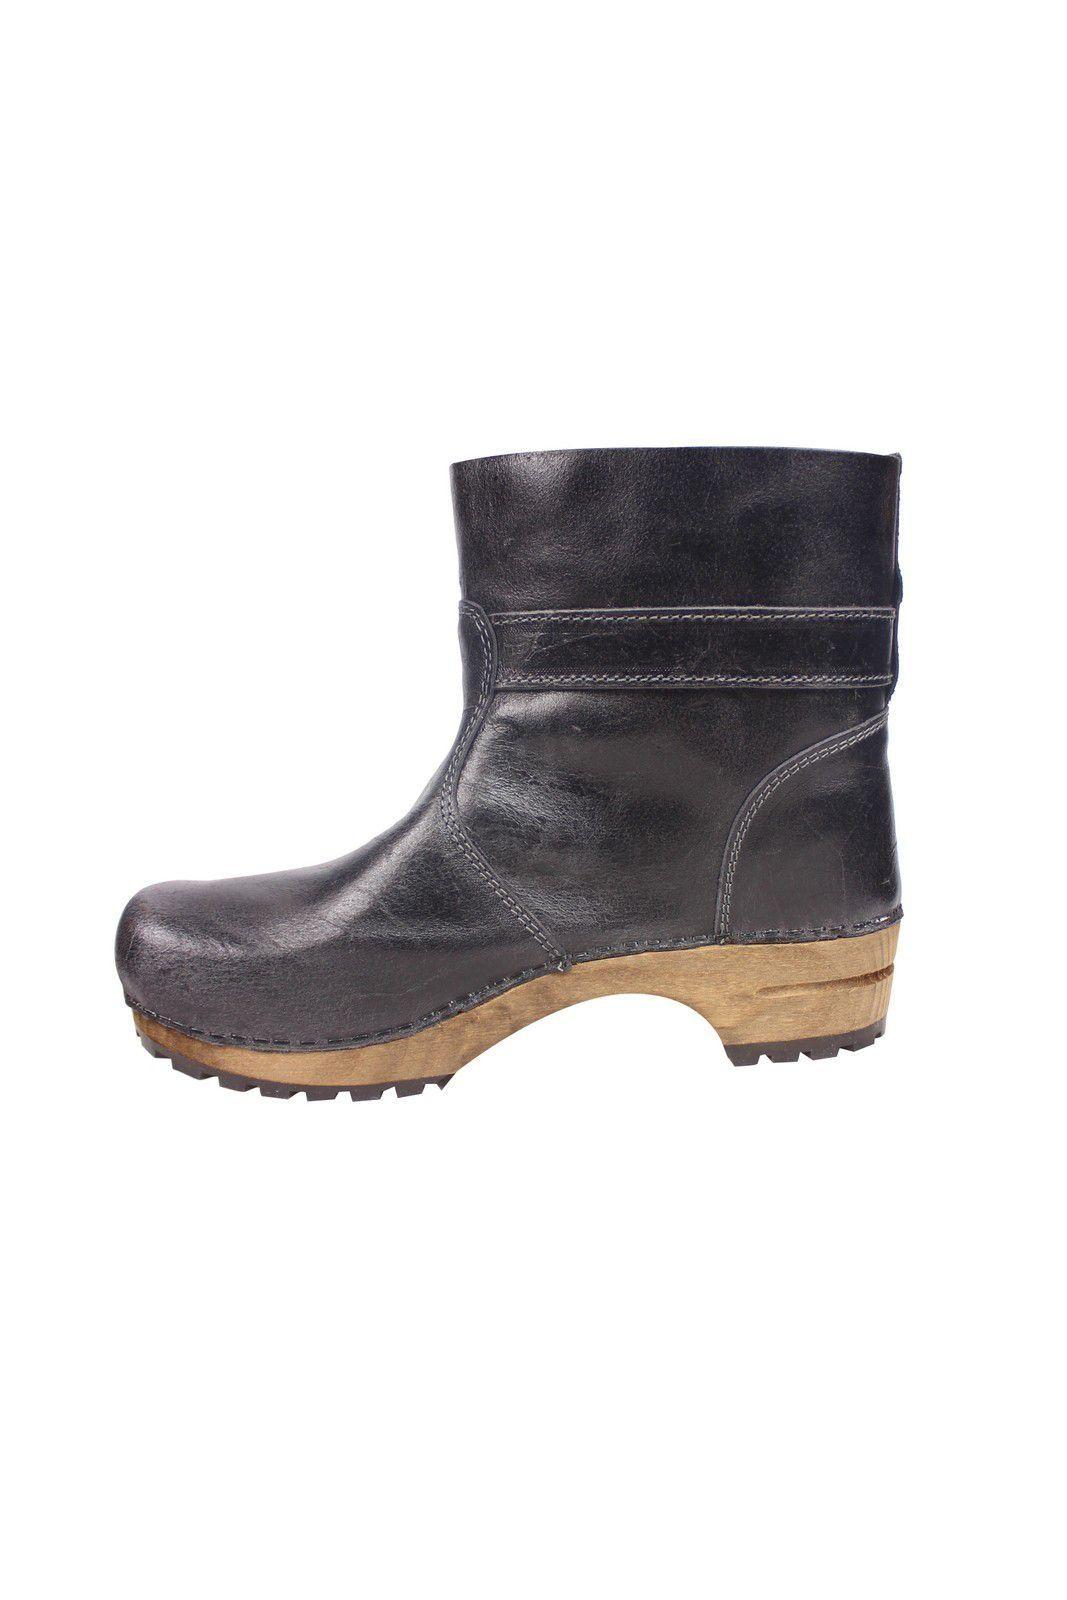 Sanita Mina Low Classic Clog Boot Black 452330 Rev Side